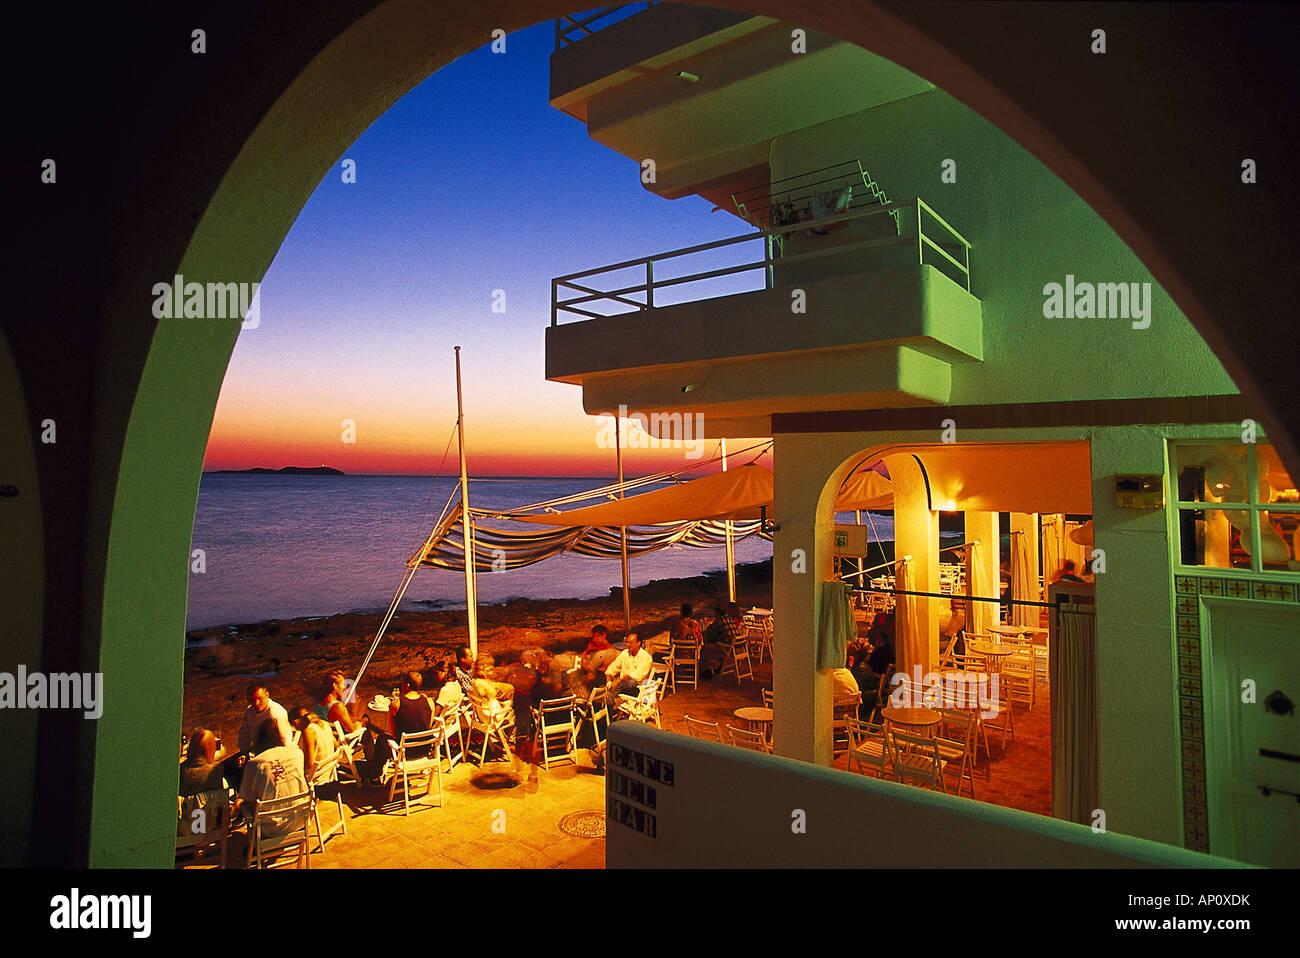 Meeting pooint Café del Mar, Sant Antoni, Ibiza, Baleares, Spain - Stock Image